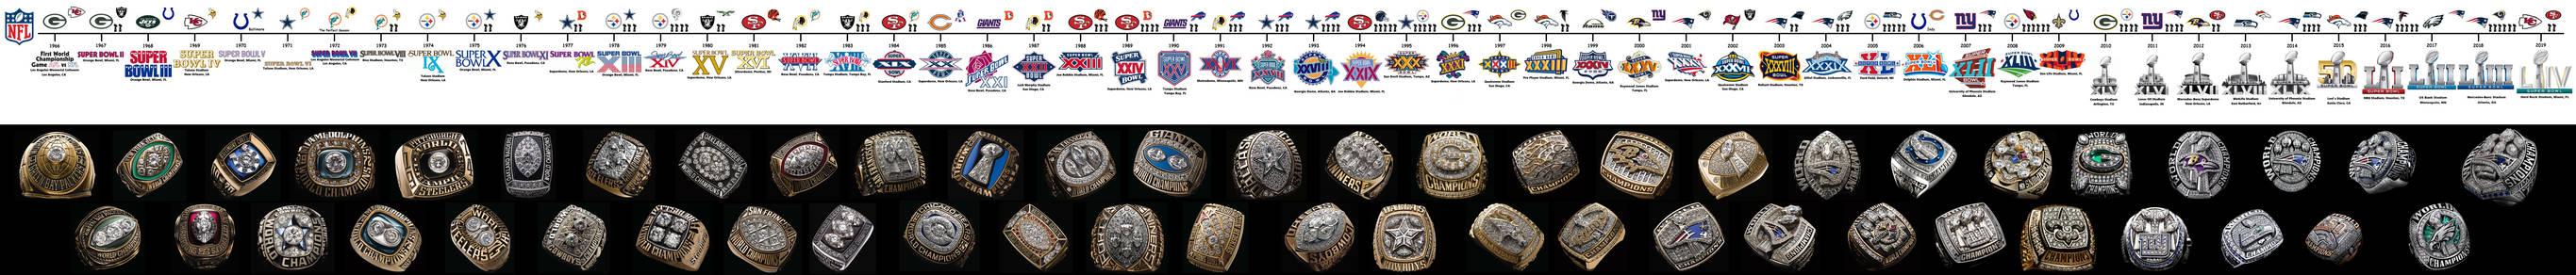 NFL Superbowl Chronology